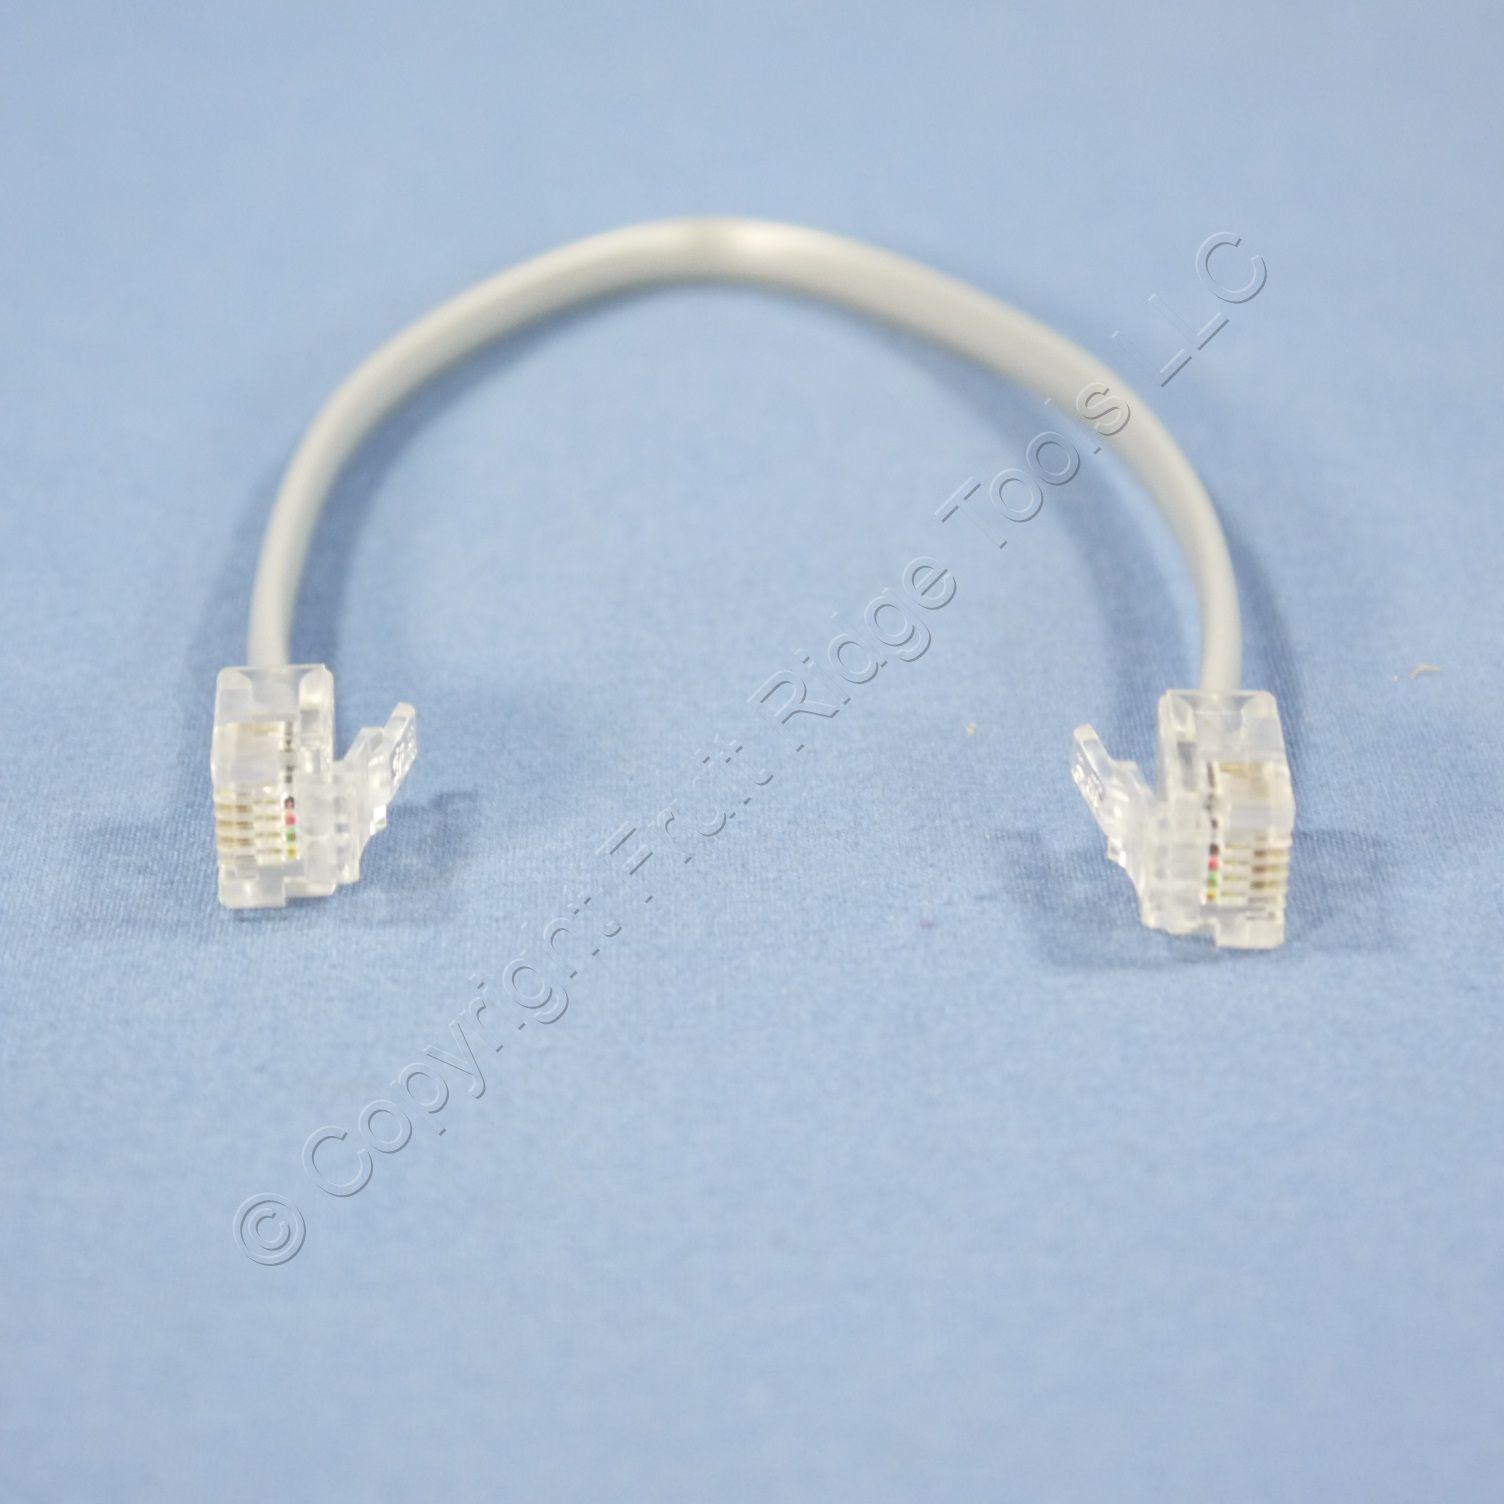 leviton gray 7 4 wire modular line cord patch jumper rj11. Black Bedroom Furniture Sets. Home Design Ideas